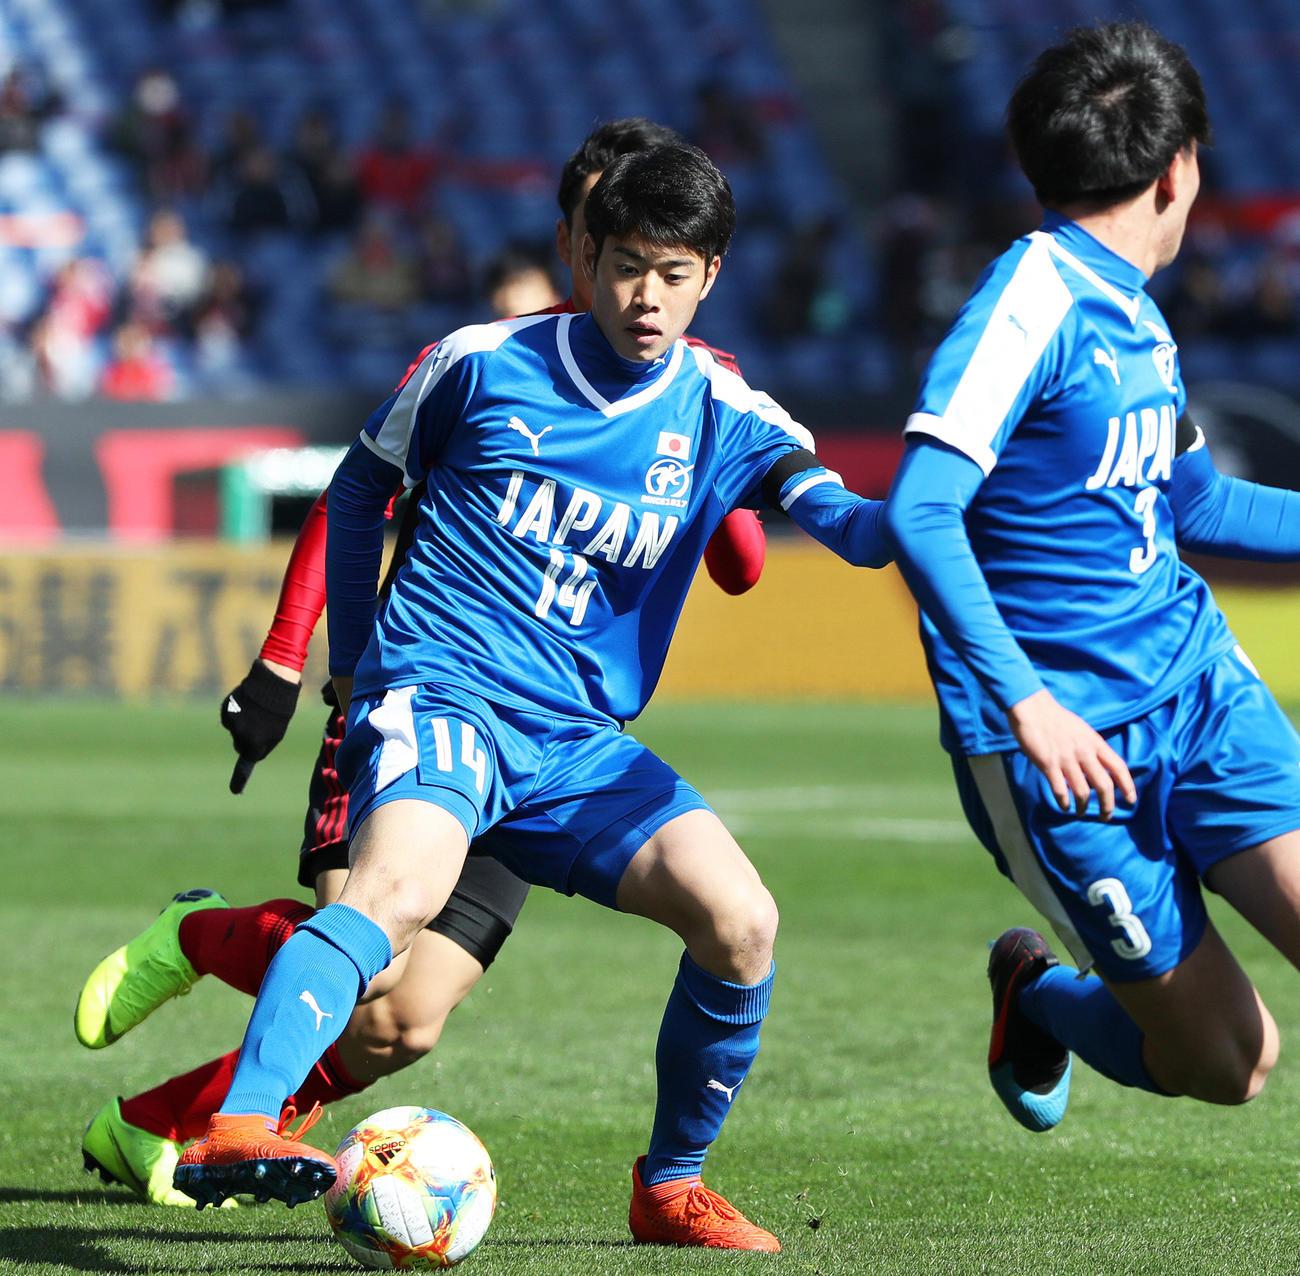 U18代表の市船橋MF鈴木唯人が来季清水に加入 - J1 : 日刊スポーツ